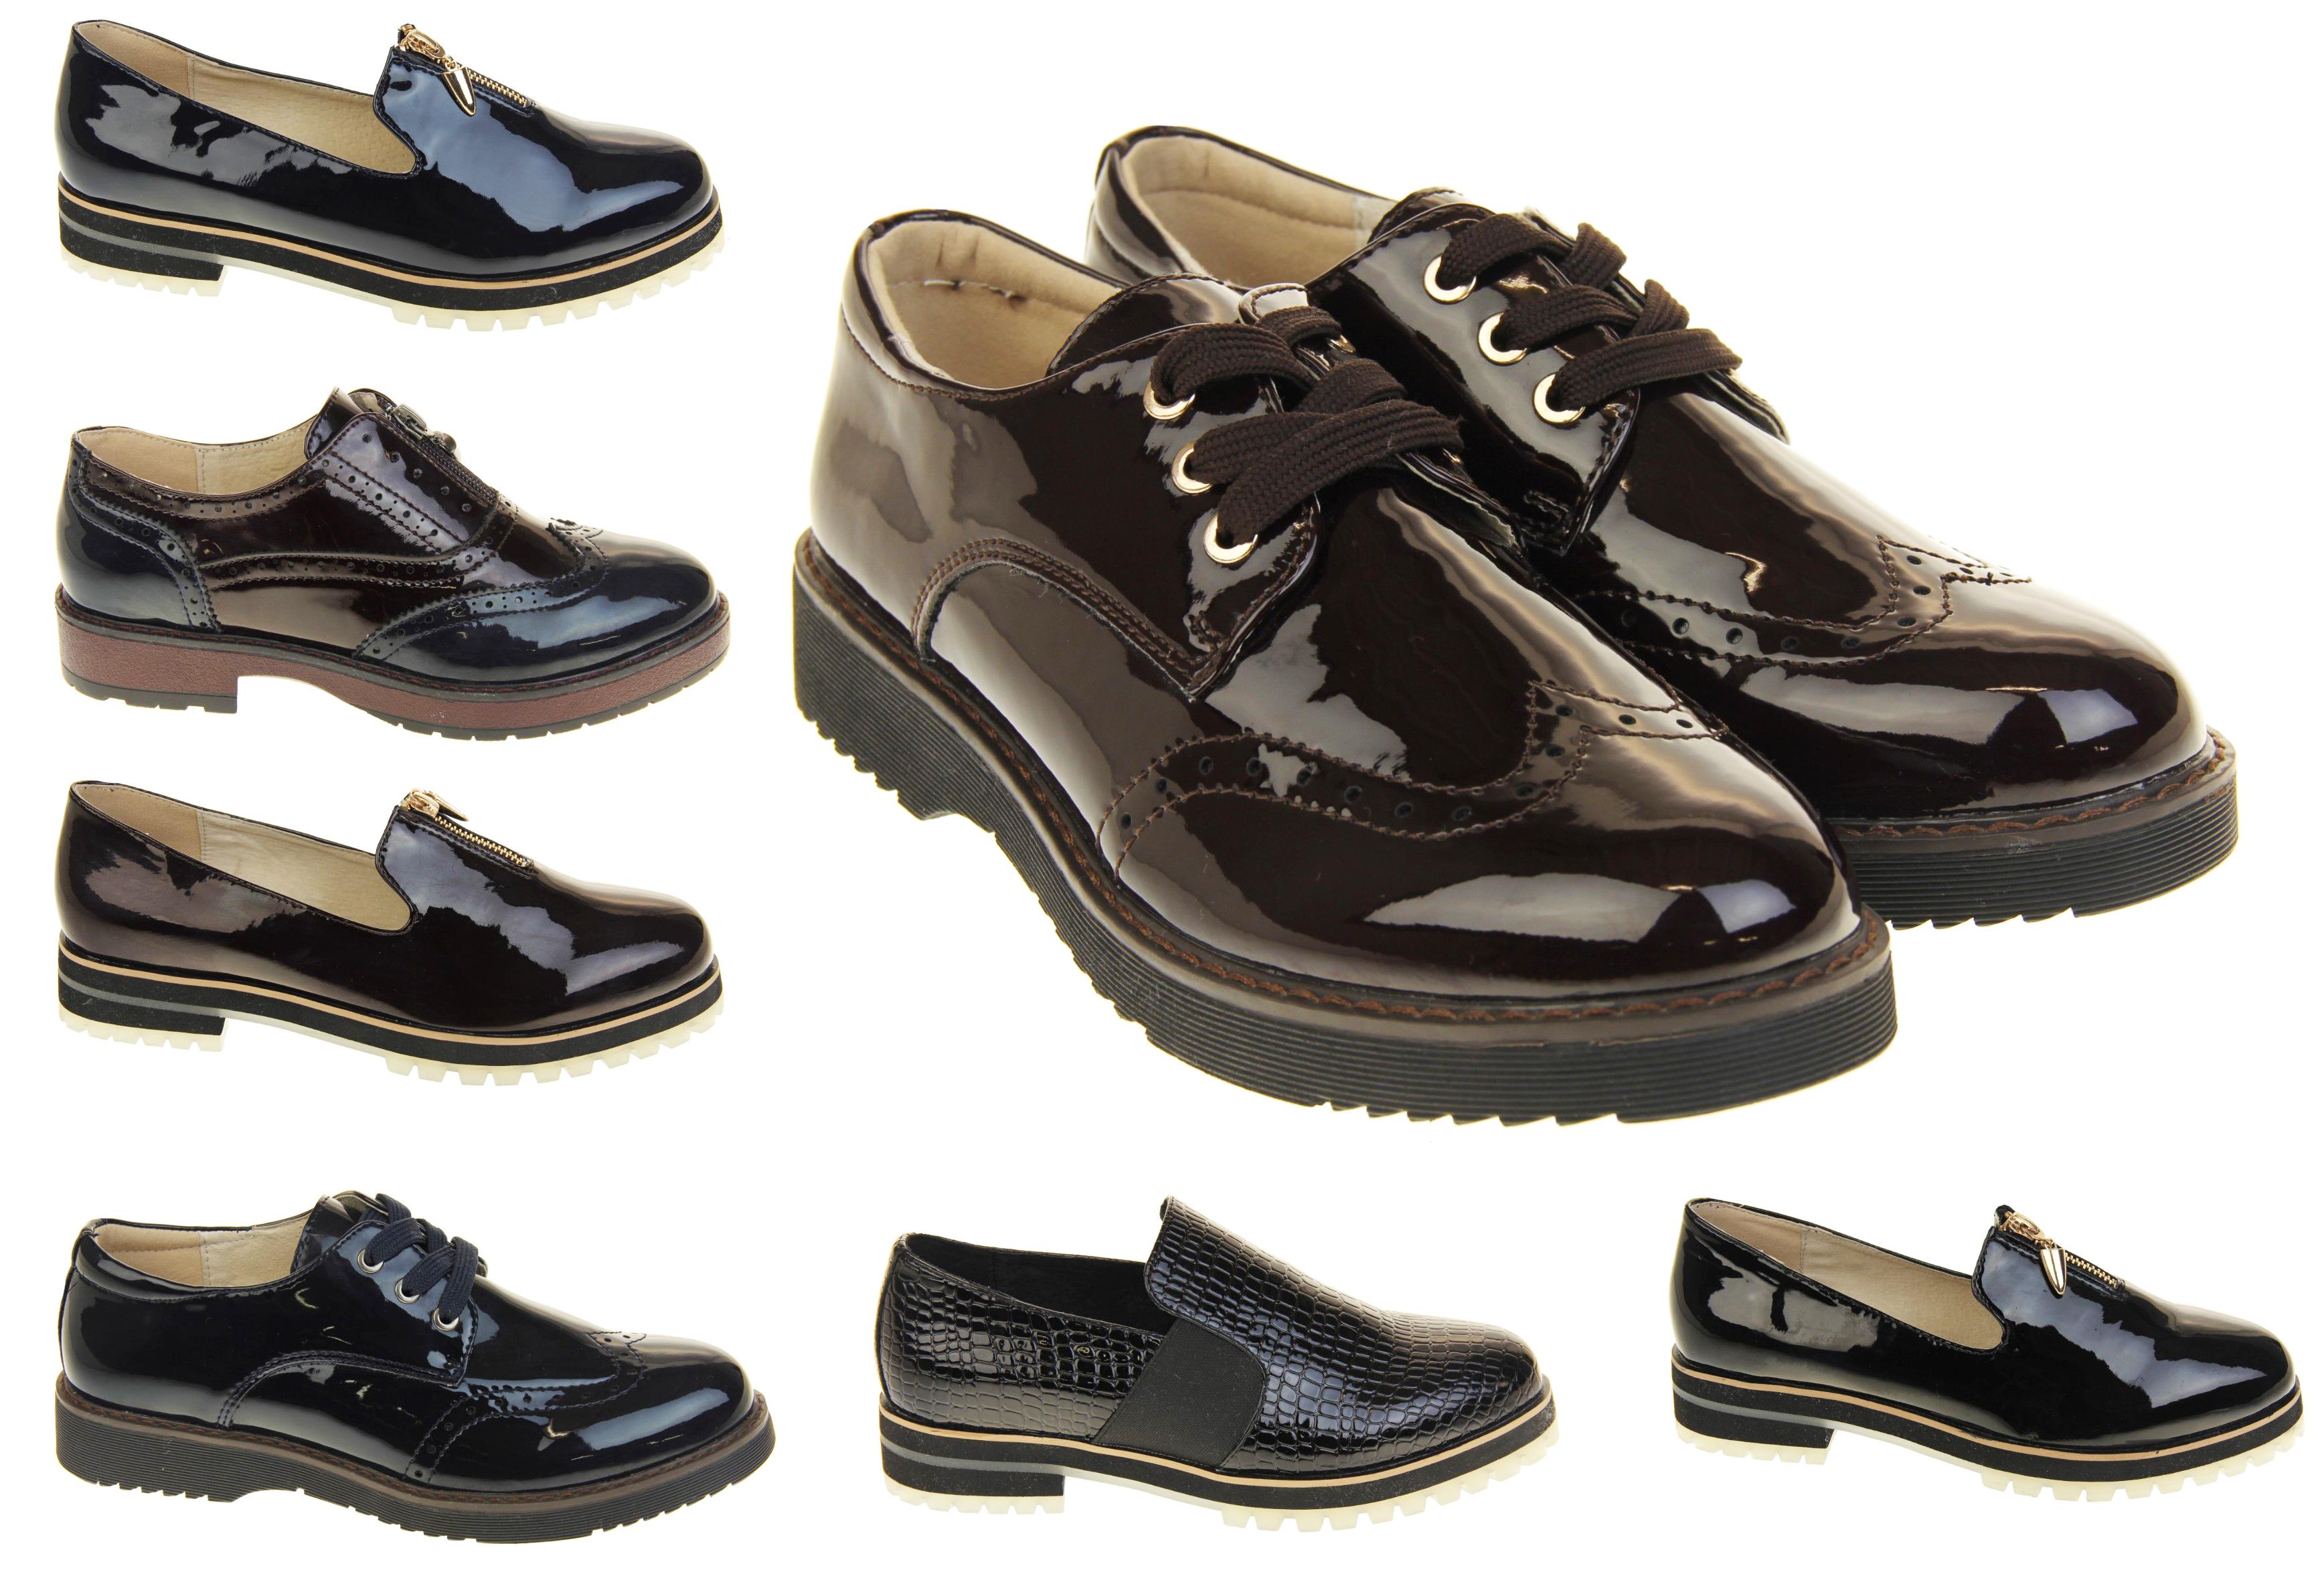 Ladies Keddo Flat Patent Oxford Loafers